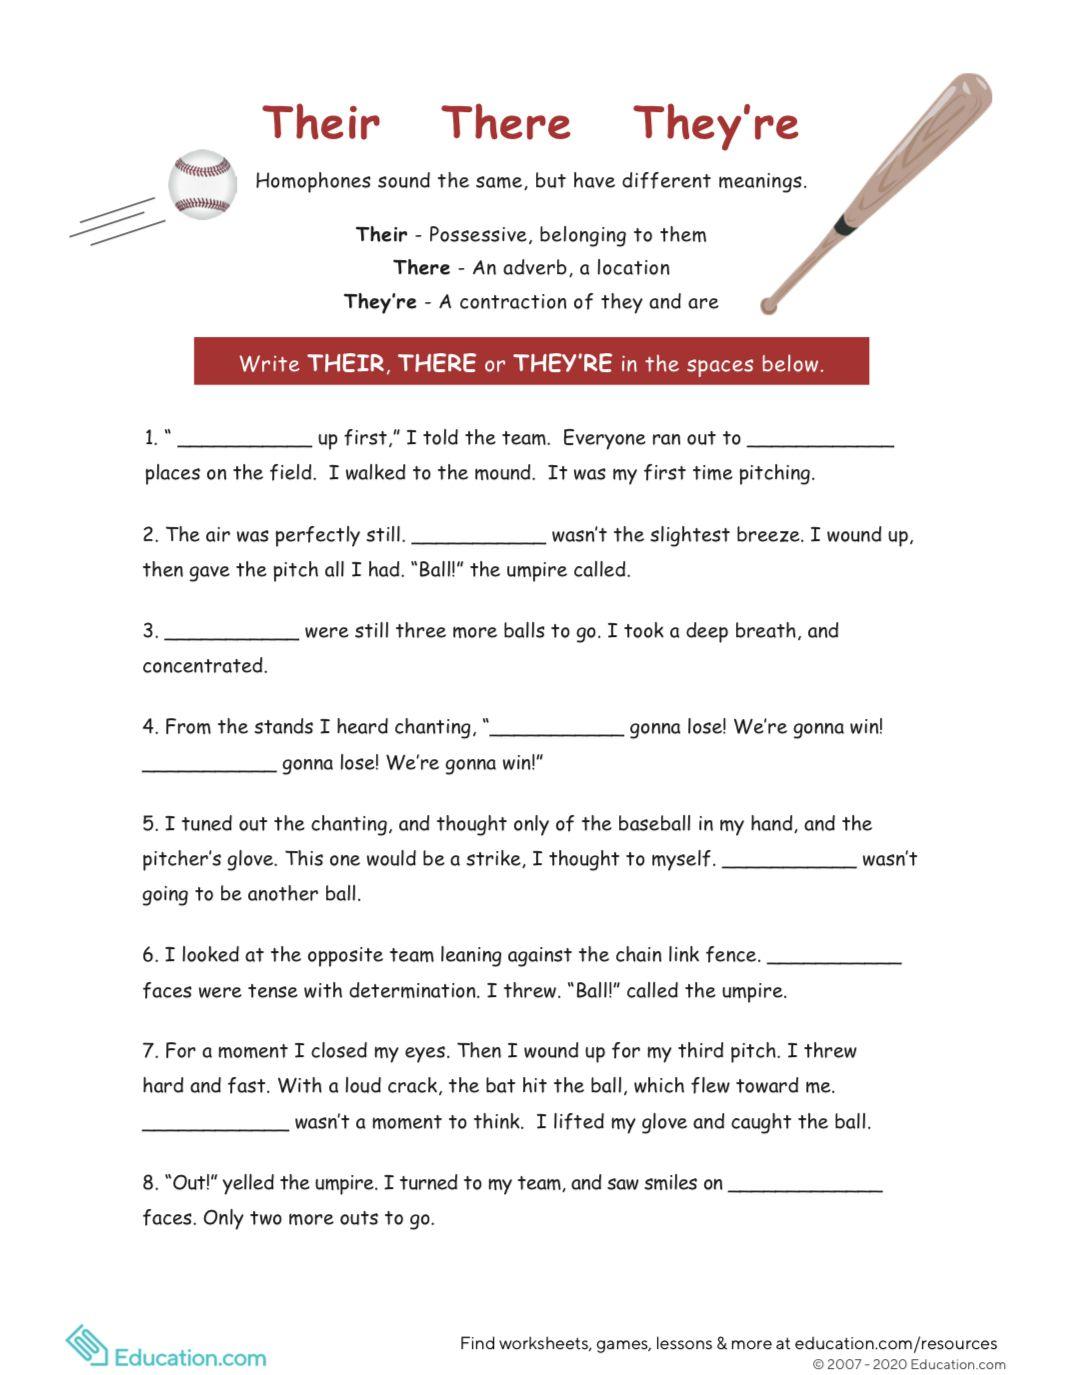 Pin By Kimmyann On Homework Helpers In